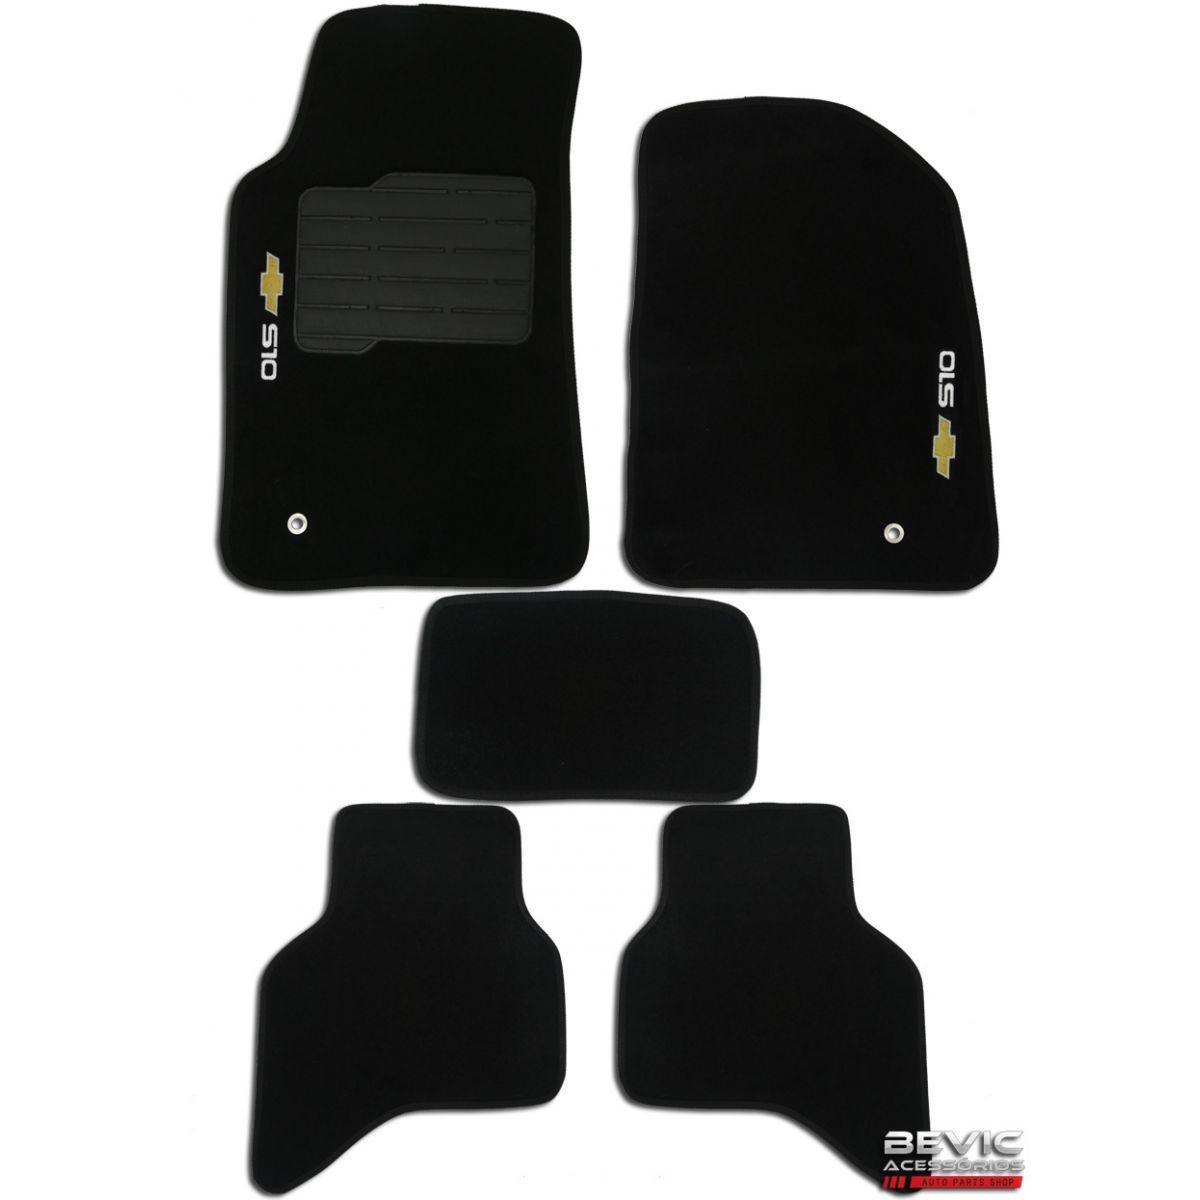 Tapete Carpete Tevic Chevrolet S10 S-10 Cabine Dupla 2012 13 14 15 16 17 18